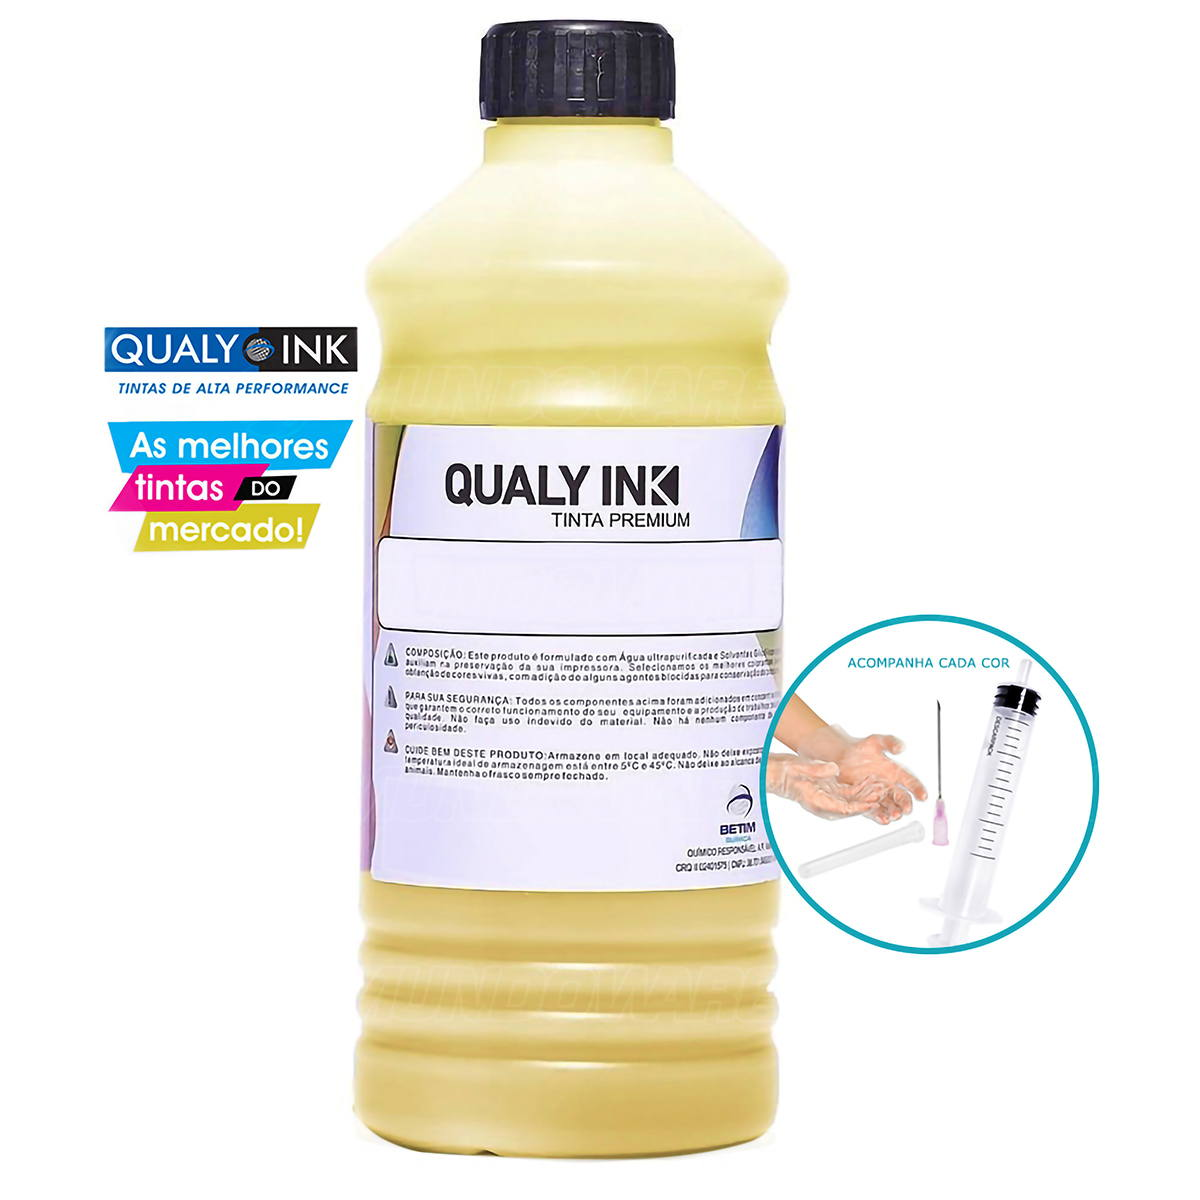 Compatível: Tinta Pigmentada Qualy-Ink YP3E-1535 Série 673 para Epson L800 L805 L810 L850 L1800 Amarelo 1L